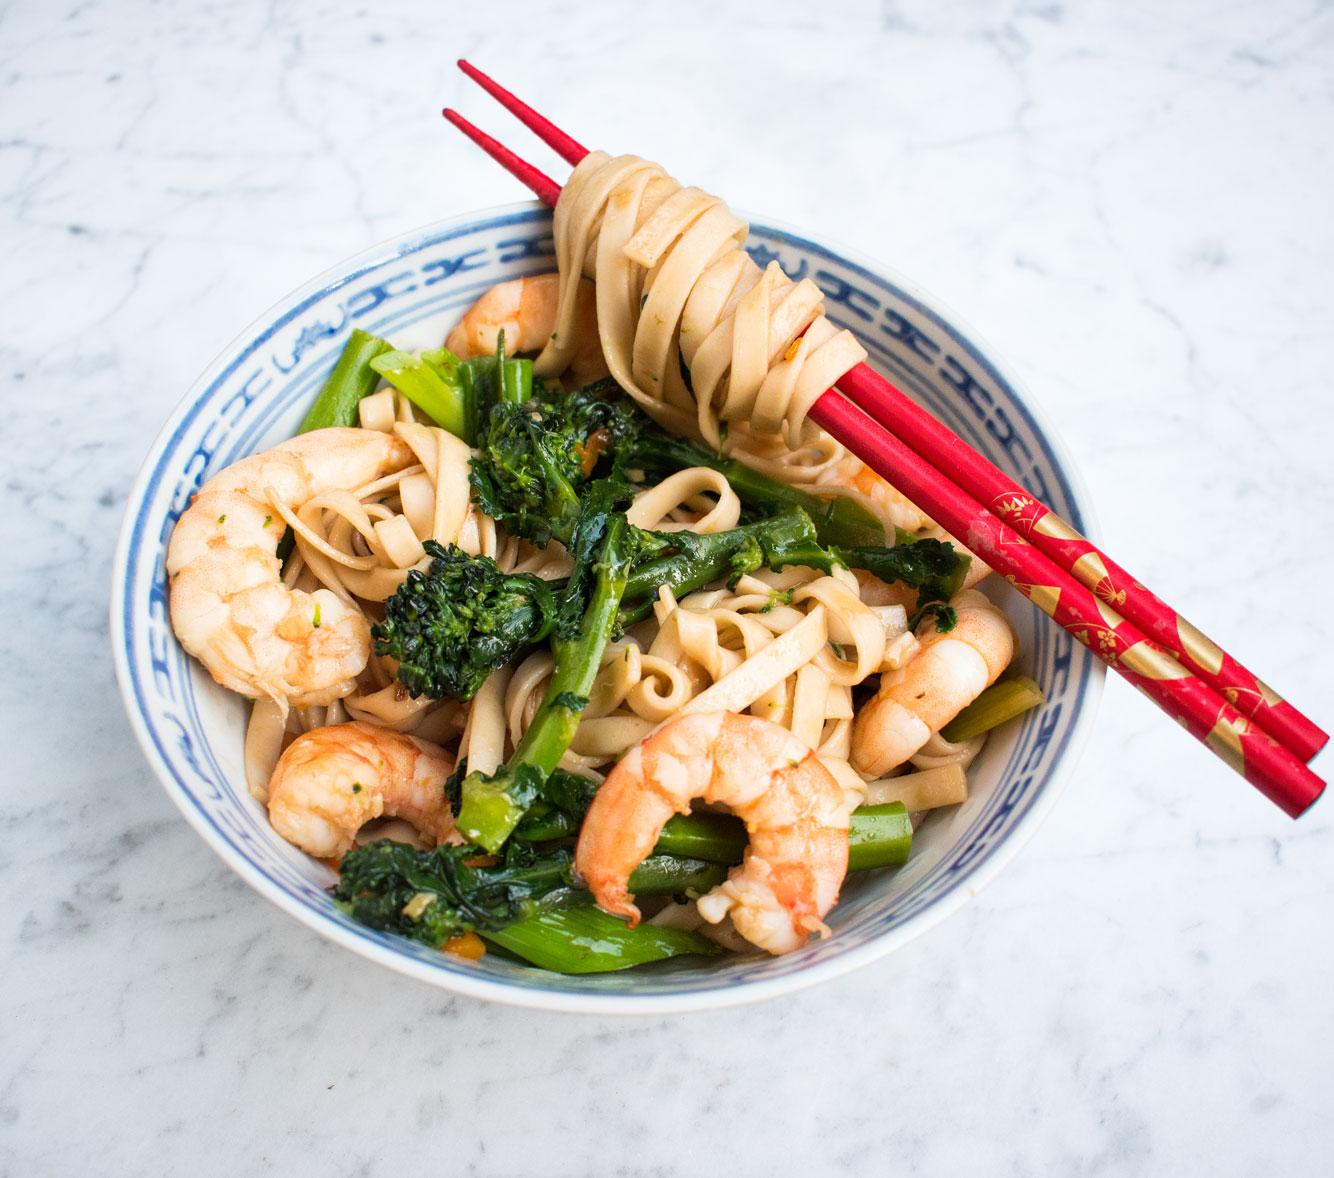 Prawn (shrimp) and broccoli noodles